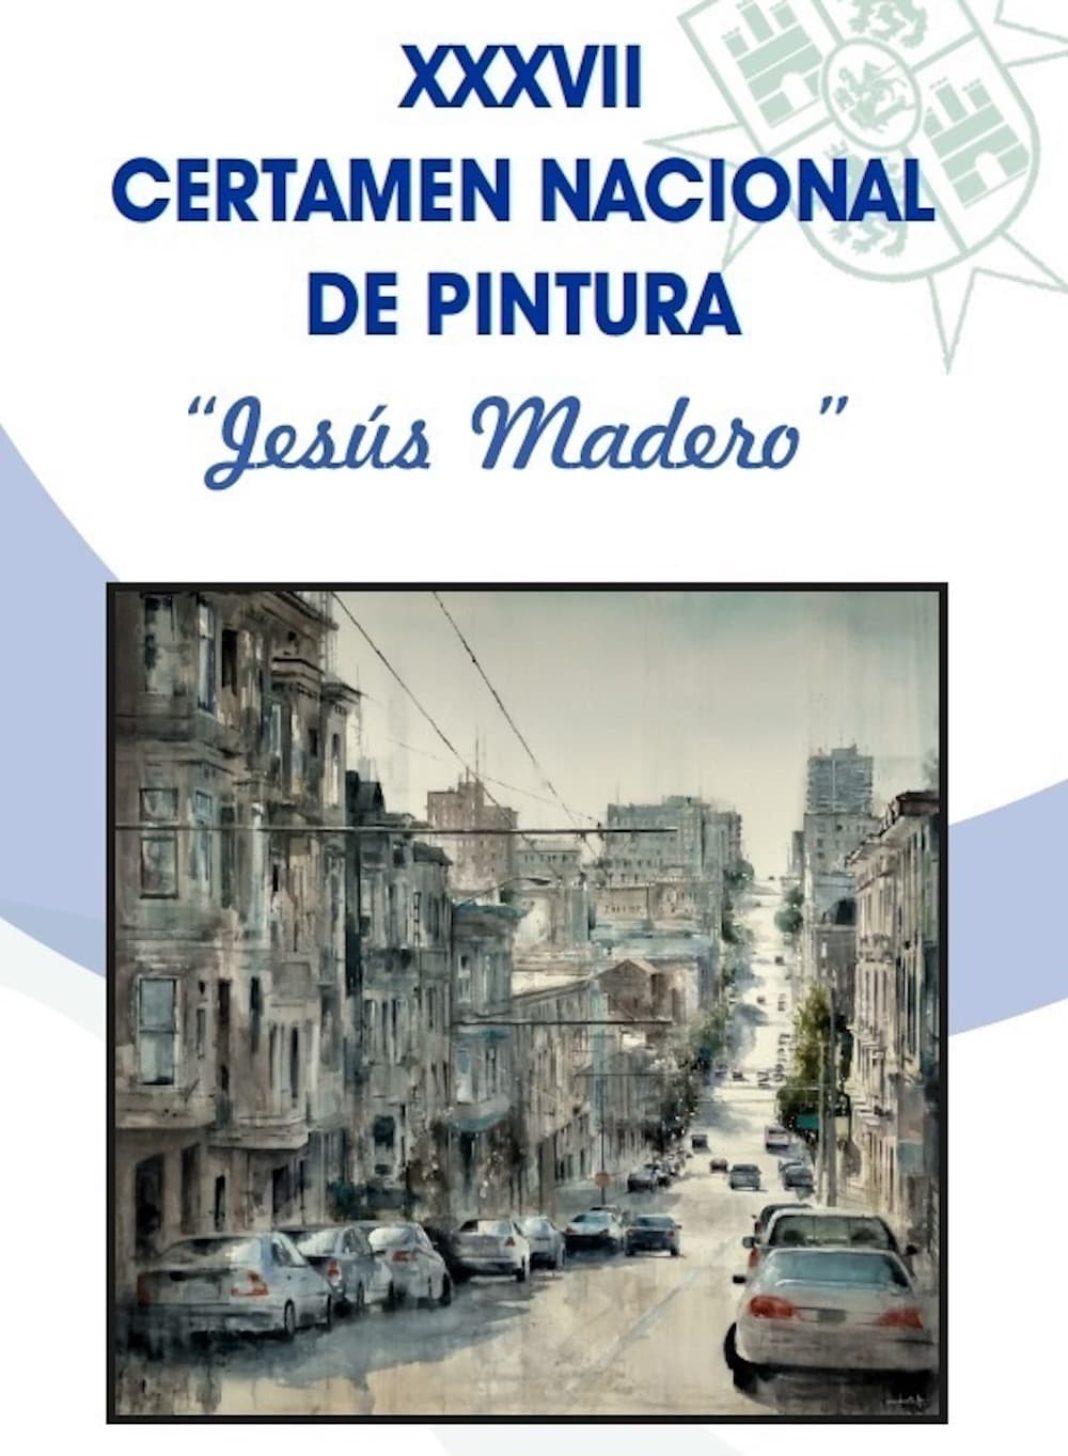 "certamen pintura nacional herencia 1068x1456 - Convocado el XXXVII Certamen Nacional de Pintura ""Jesús Madero"""